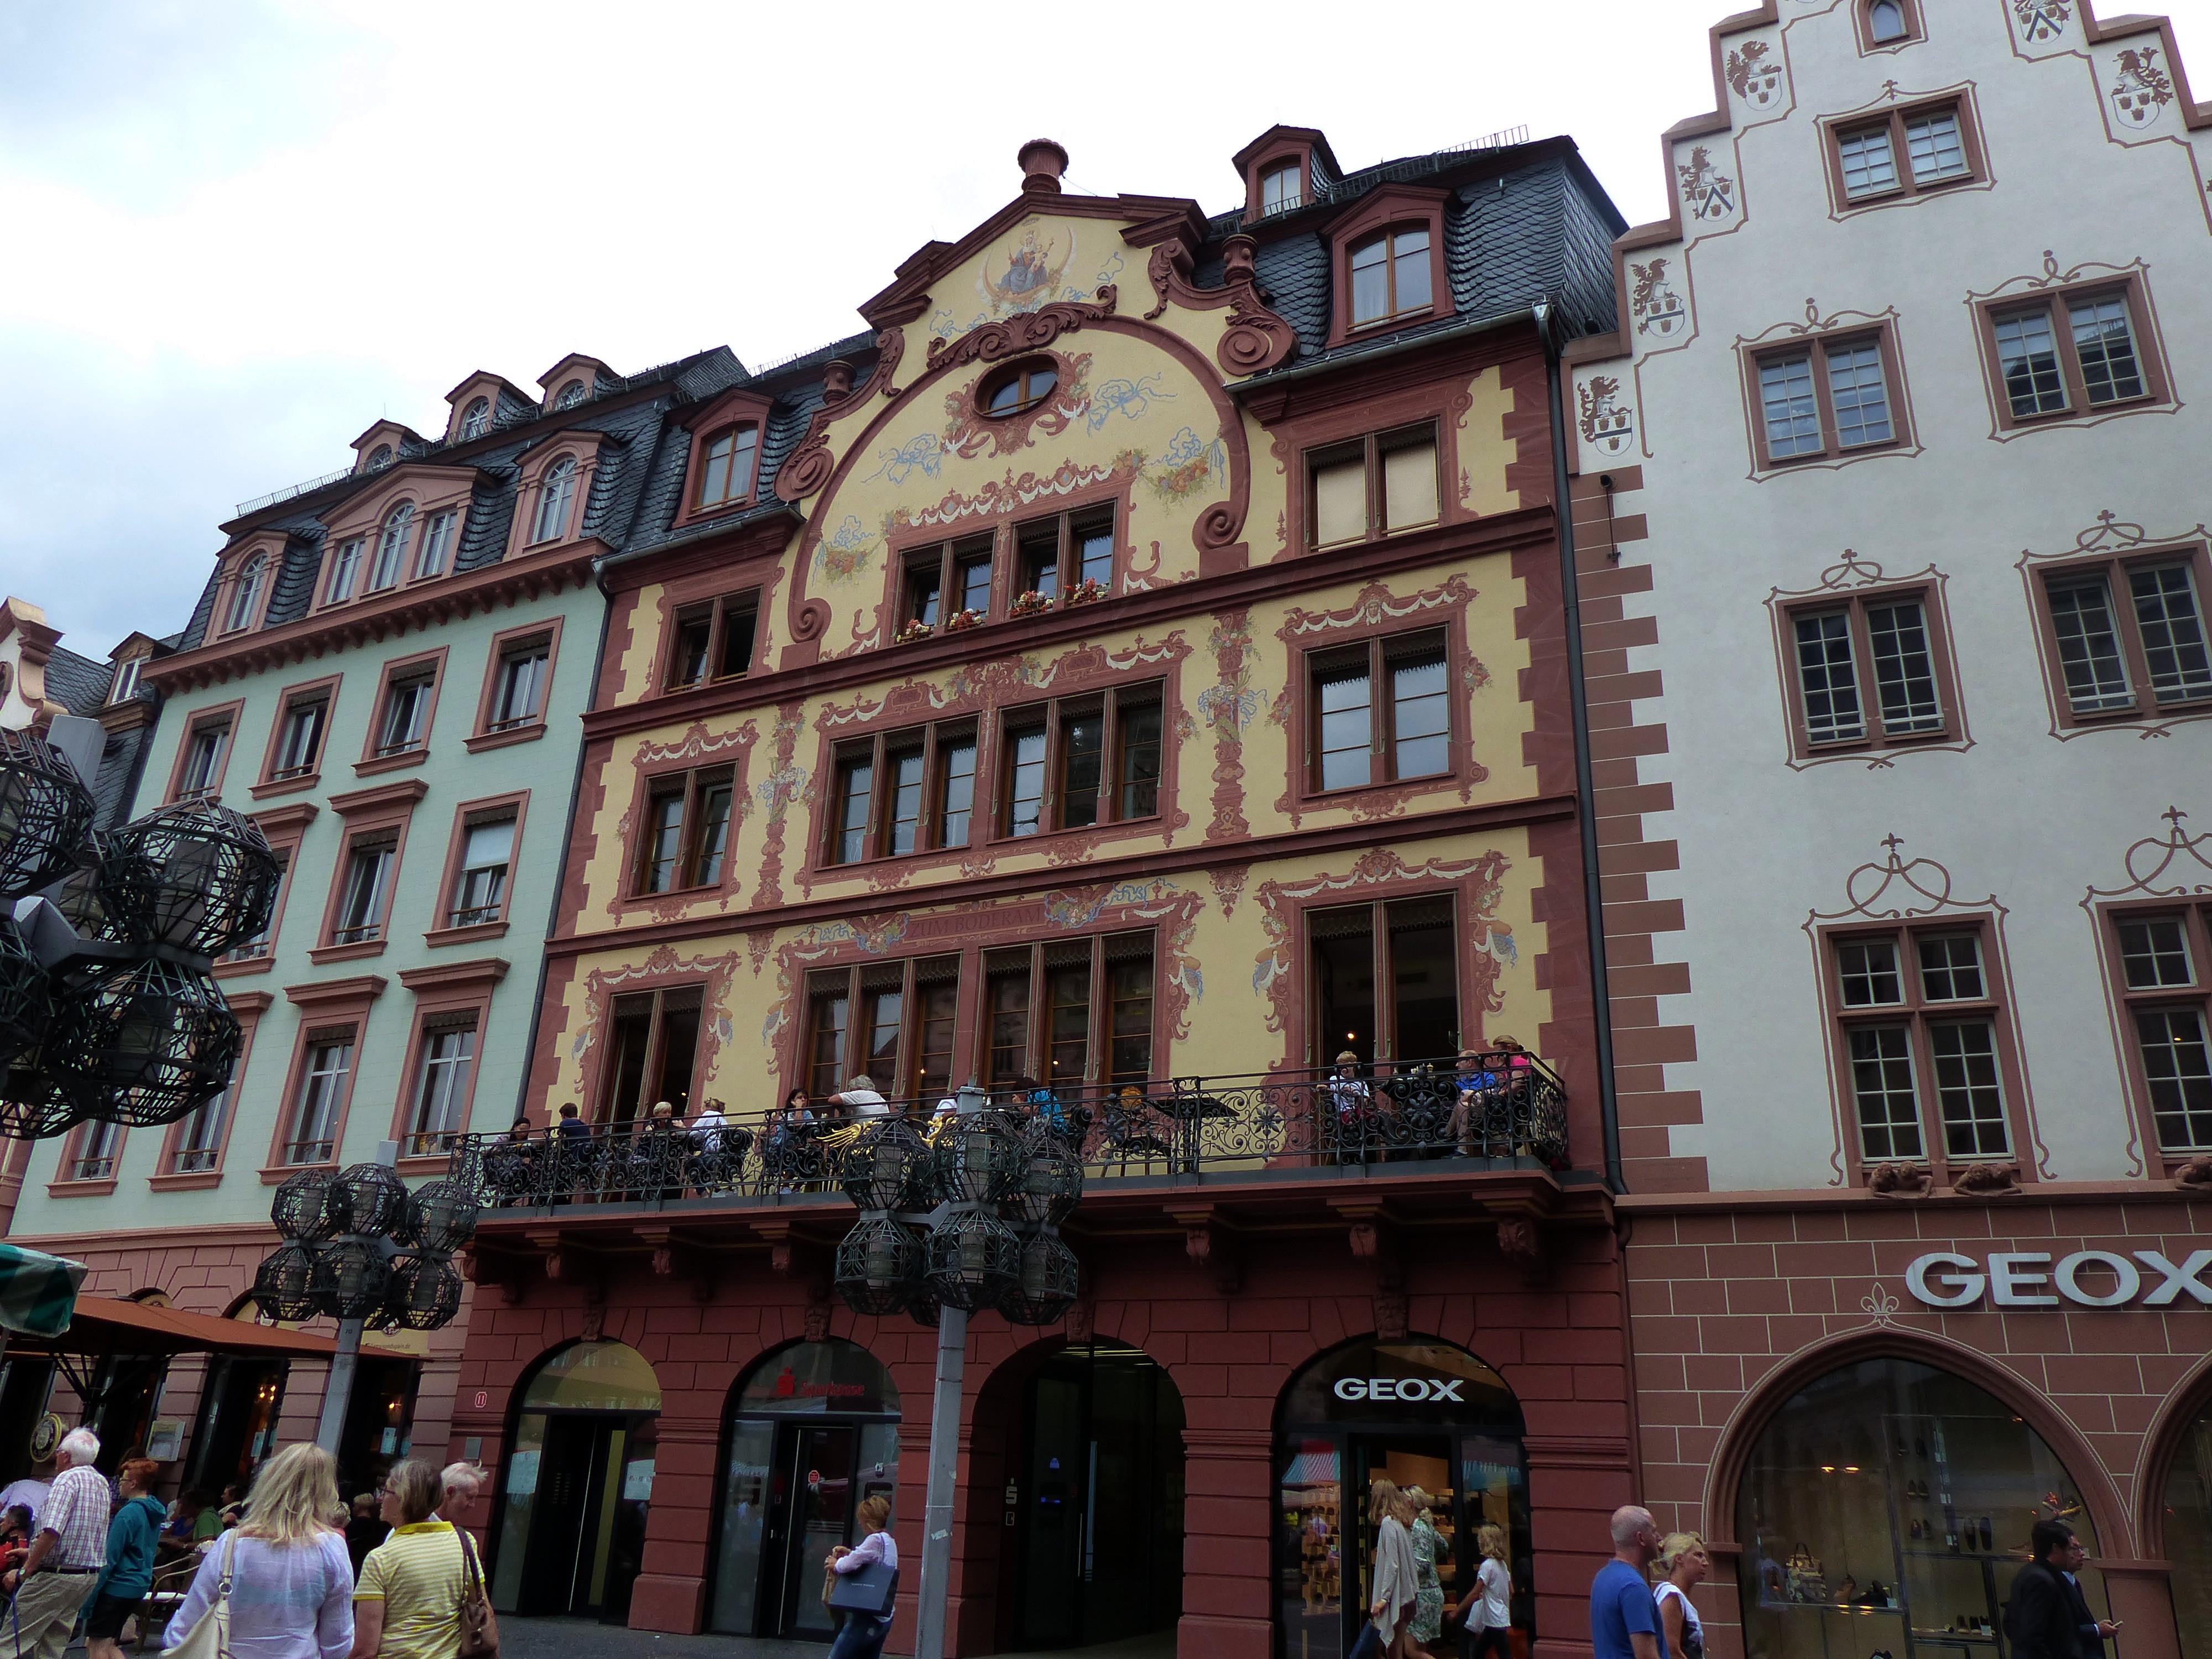 Architekt Mainz file mainz zum boderam barockbau architekt johann maximilian